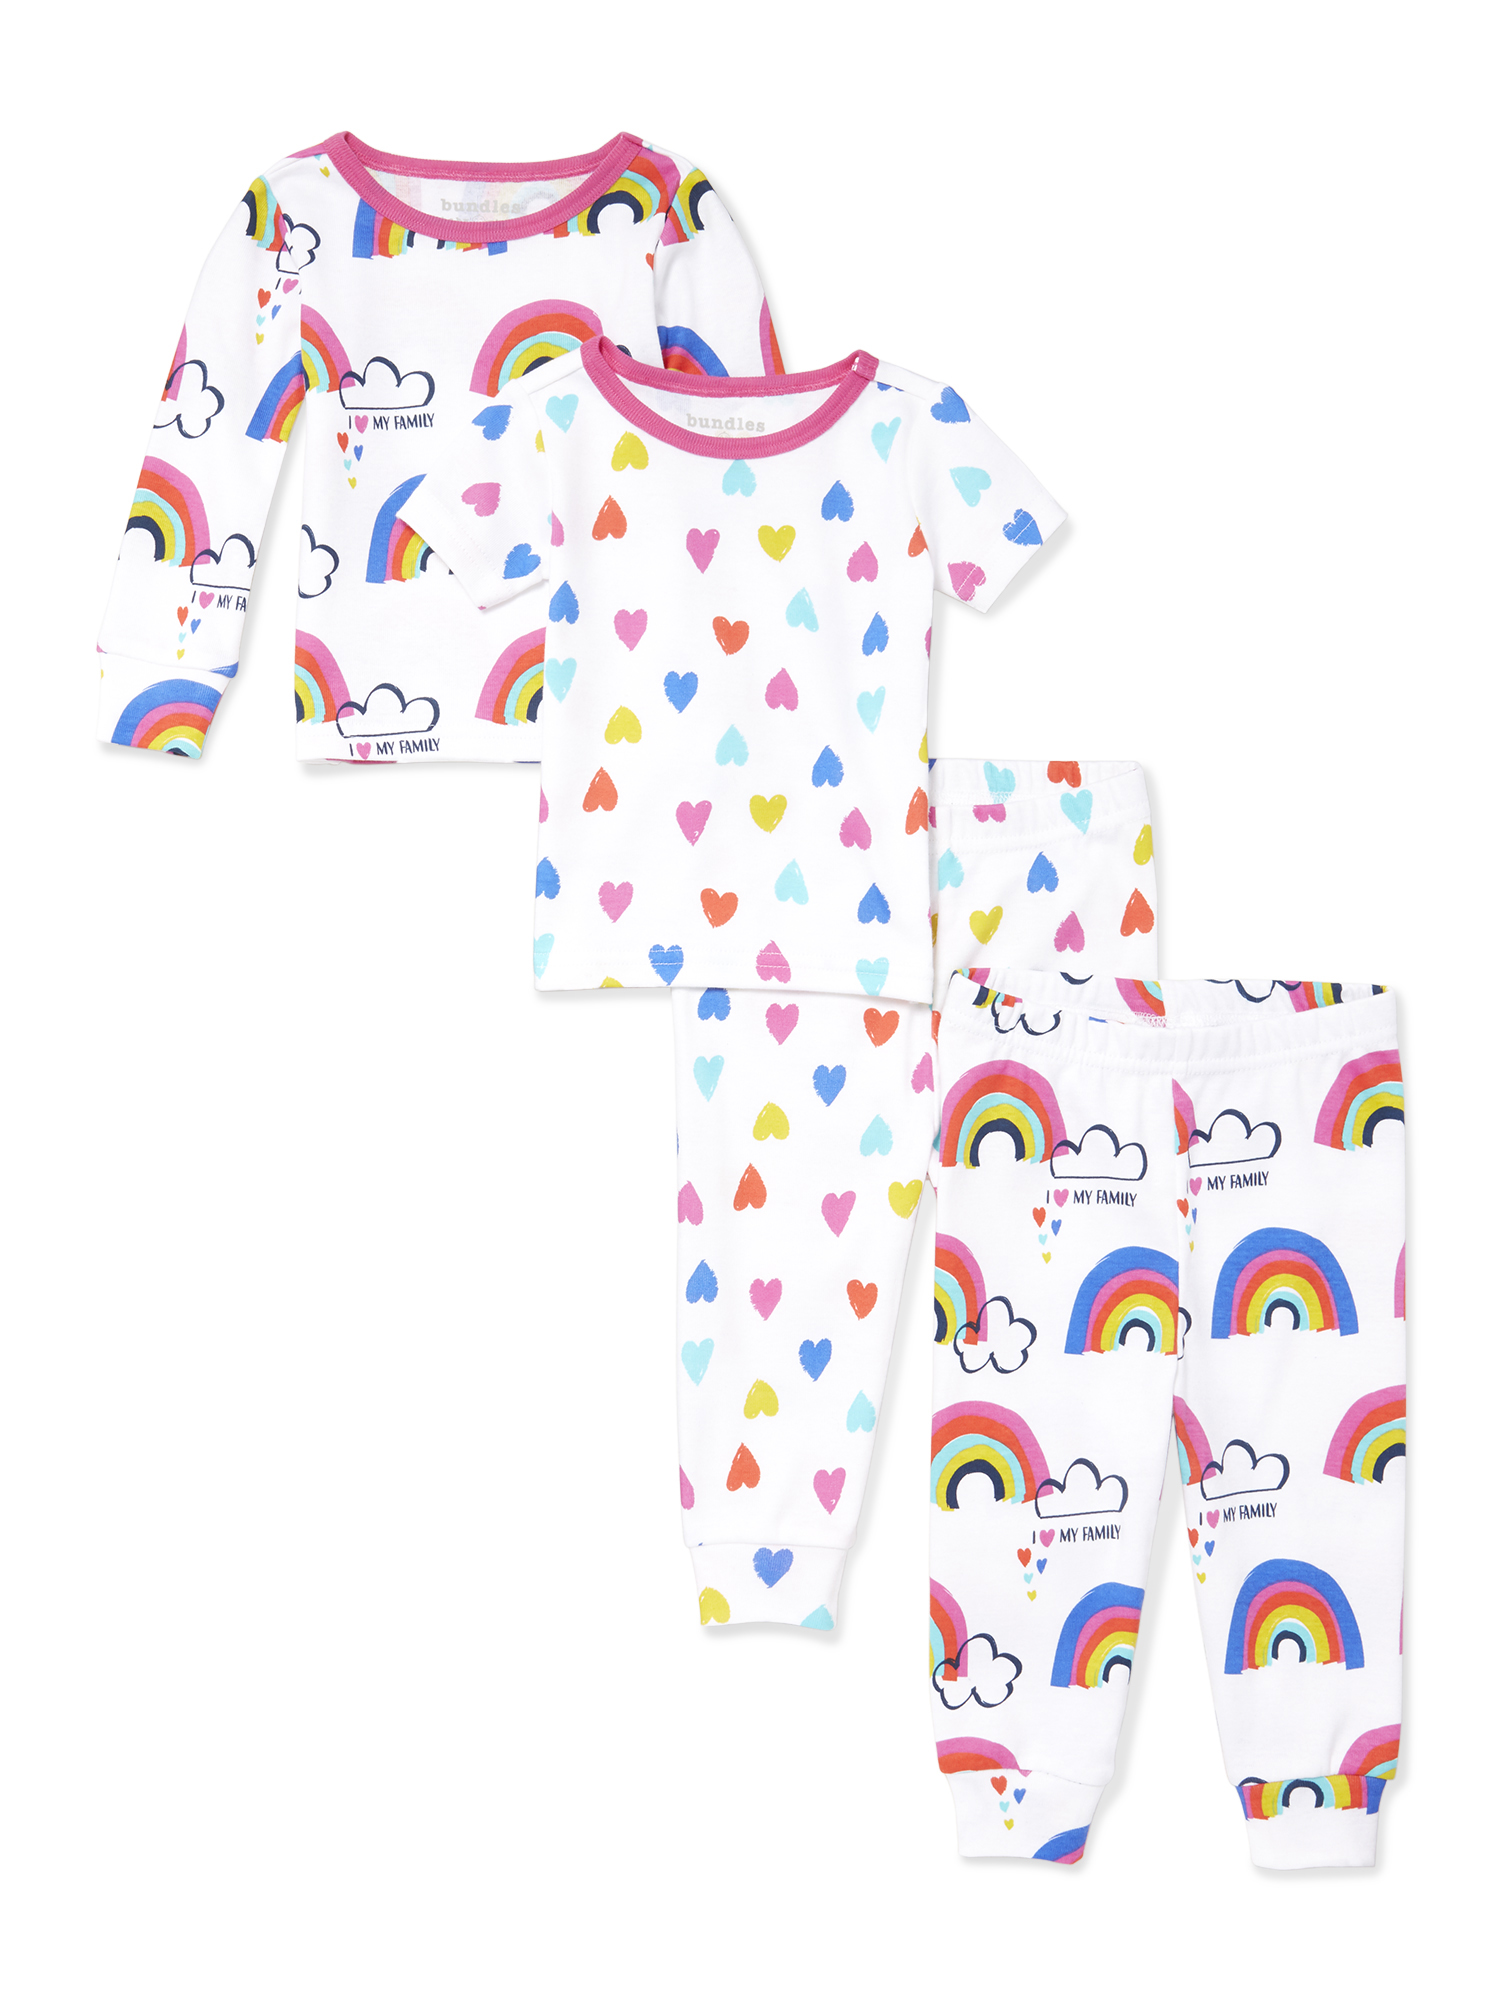 Short Sleeve Snug-Fit Pajamas, 4pc Set (Baby and Toddler Girls)